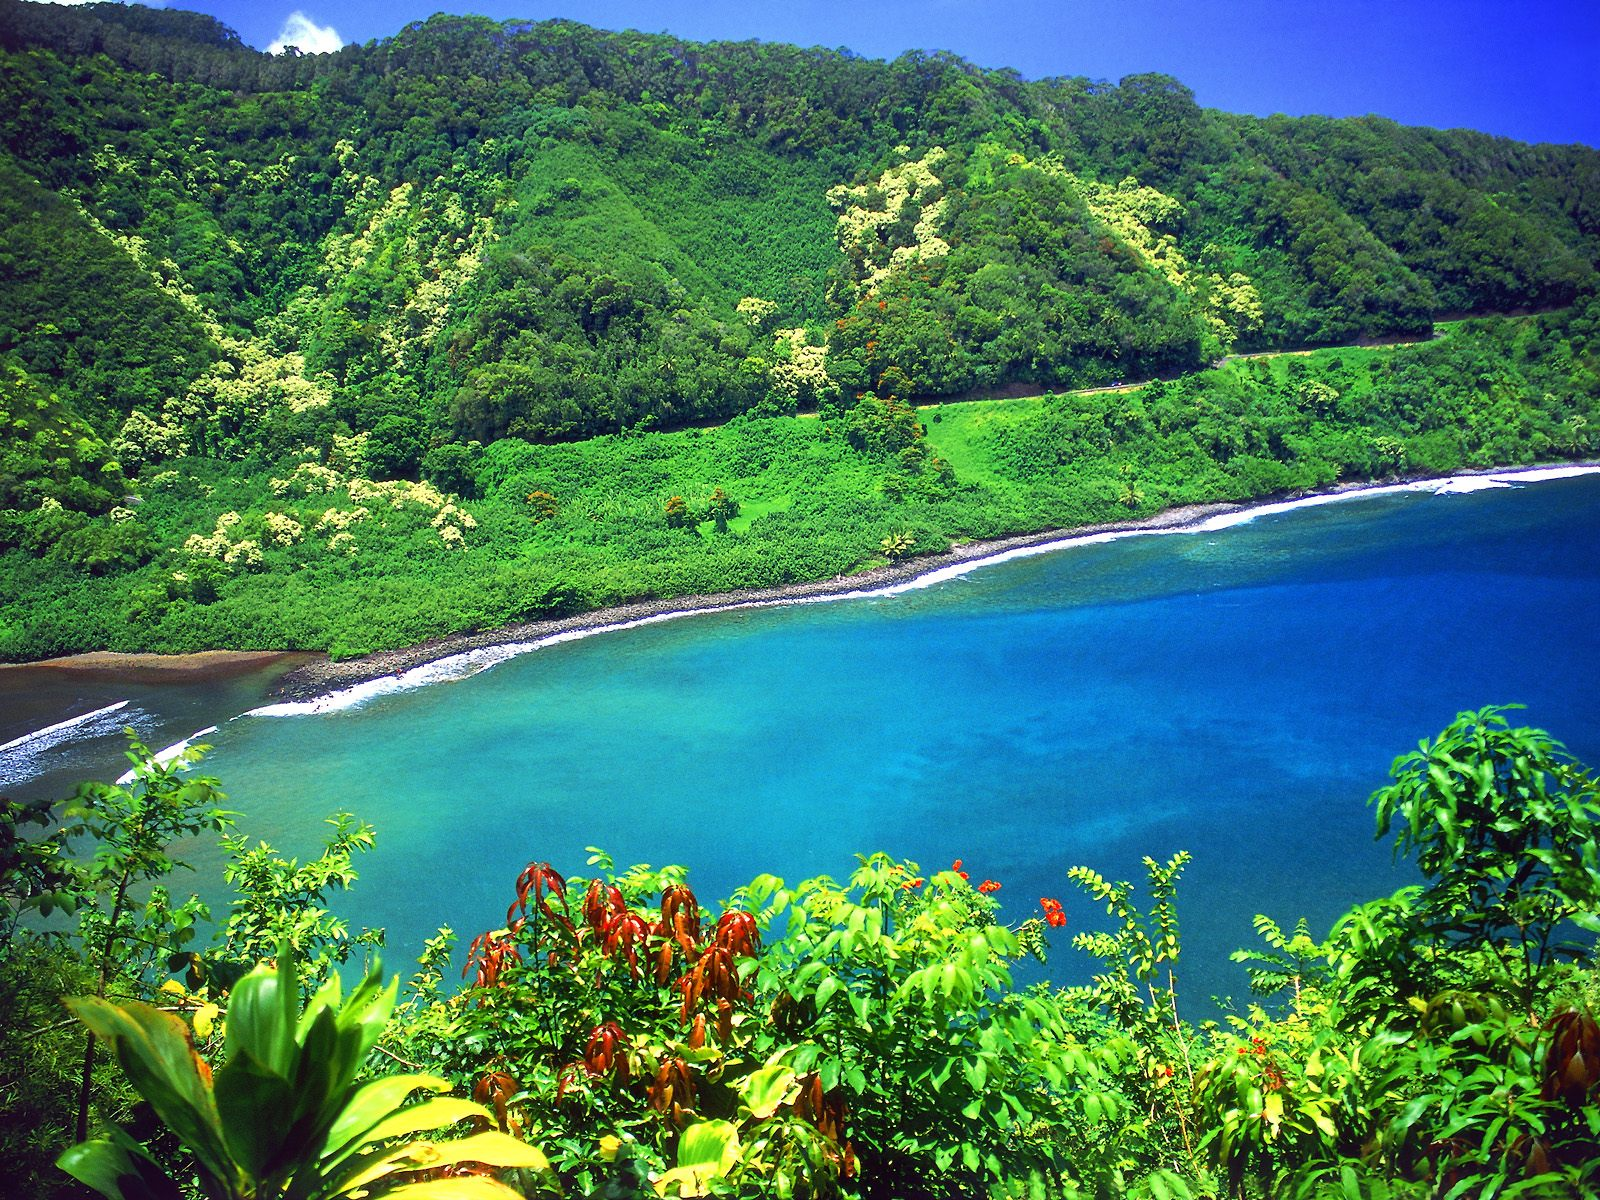 Hawaii - L'isola di Maui